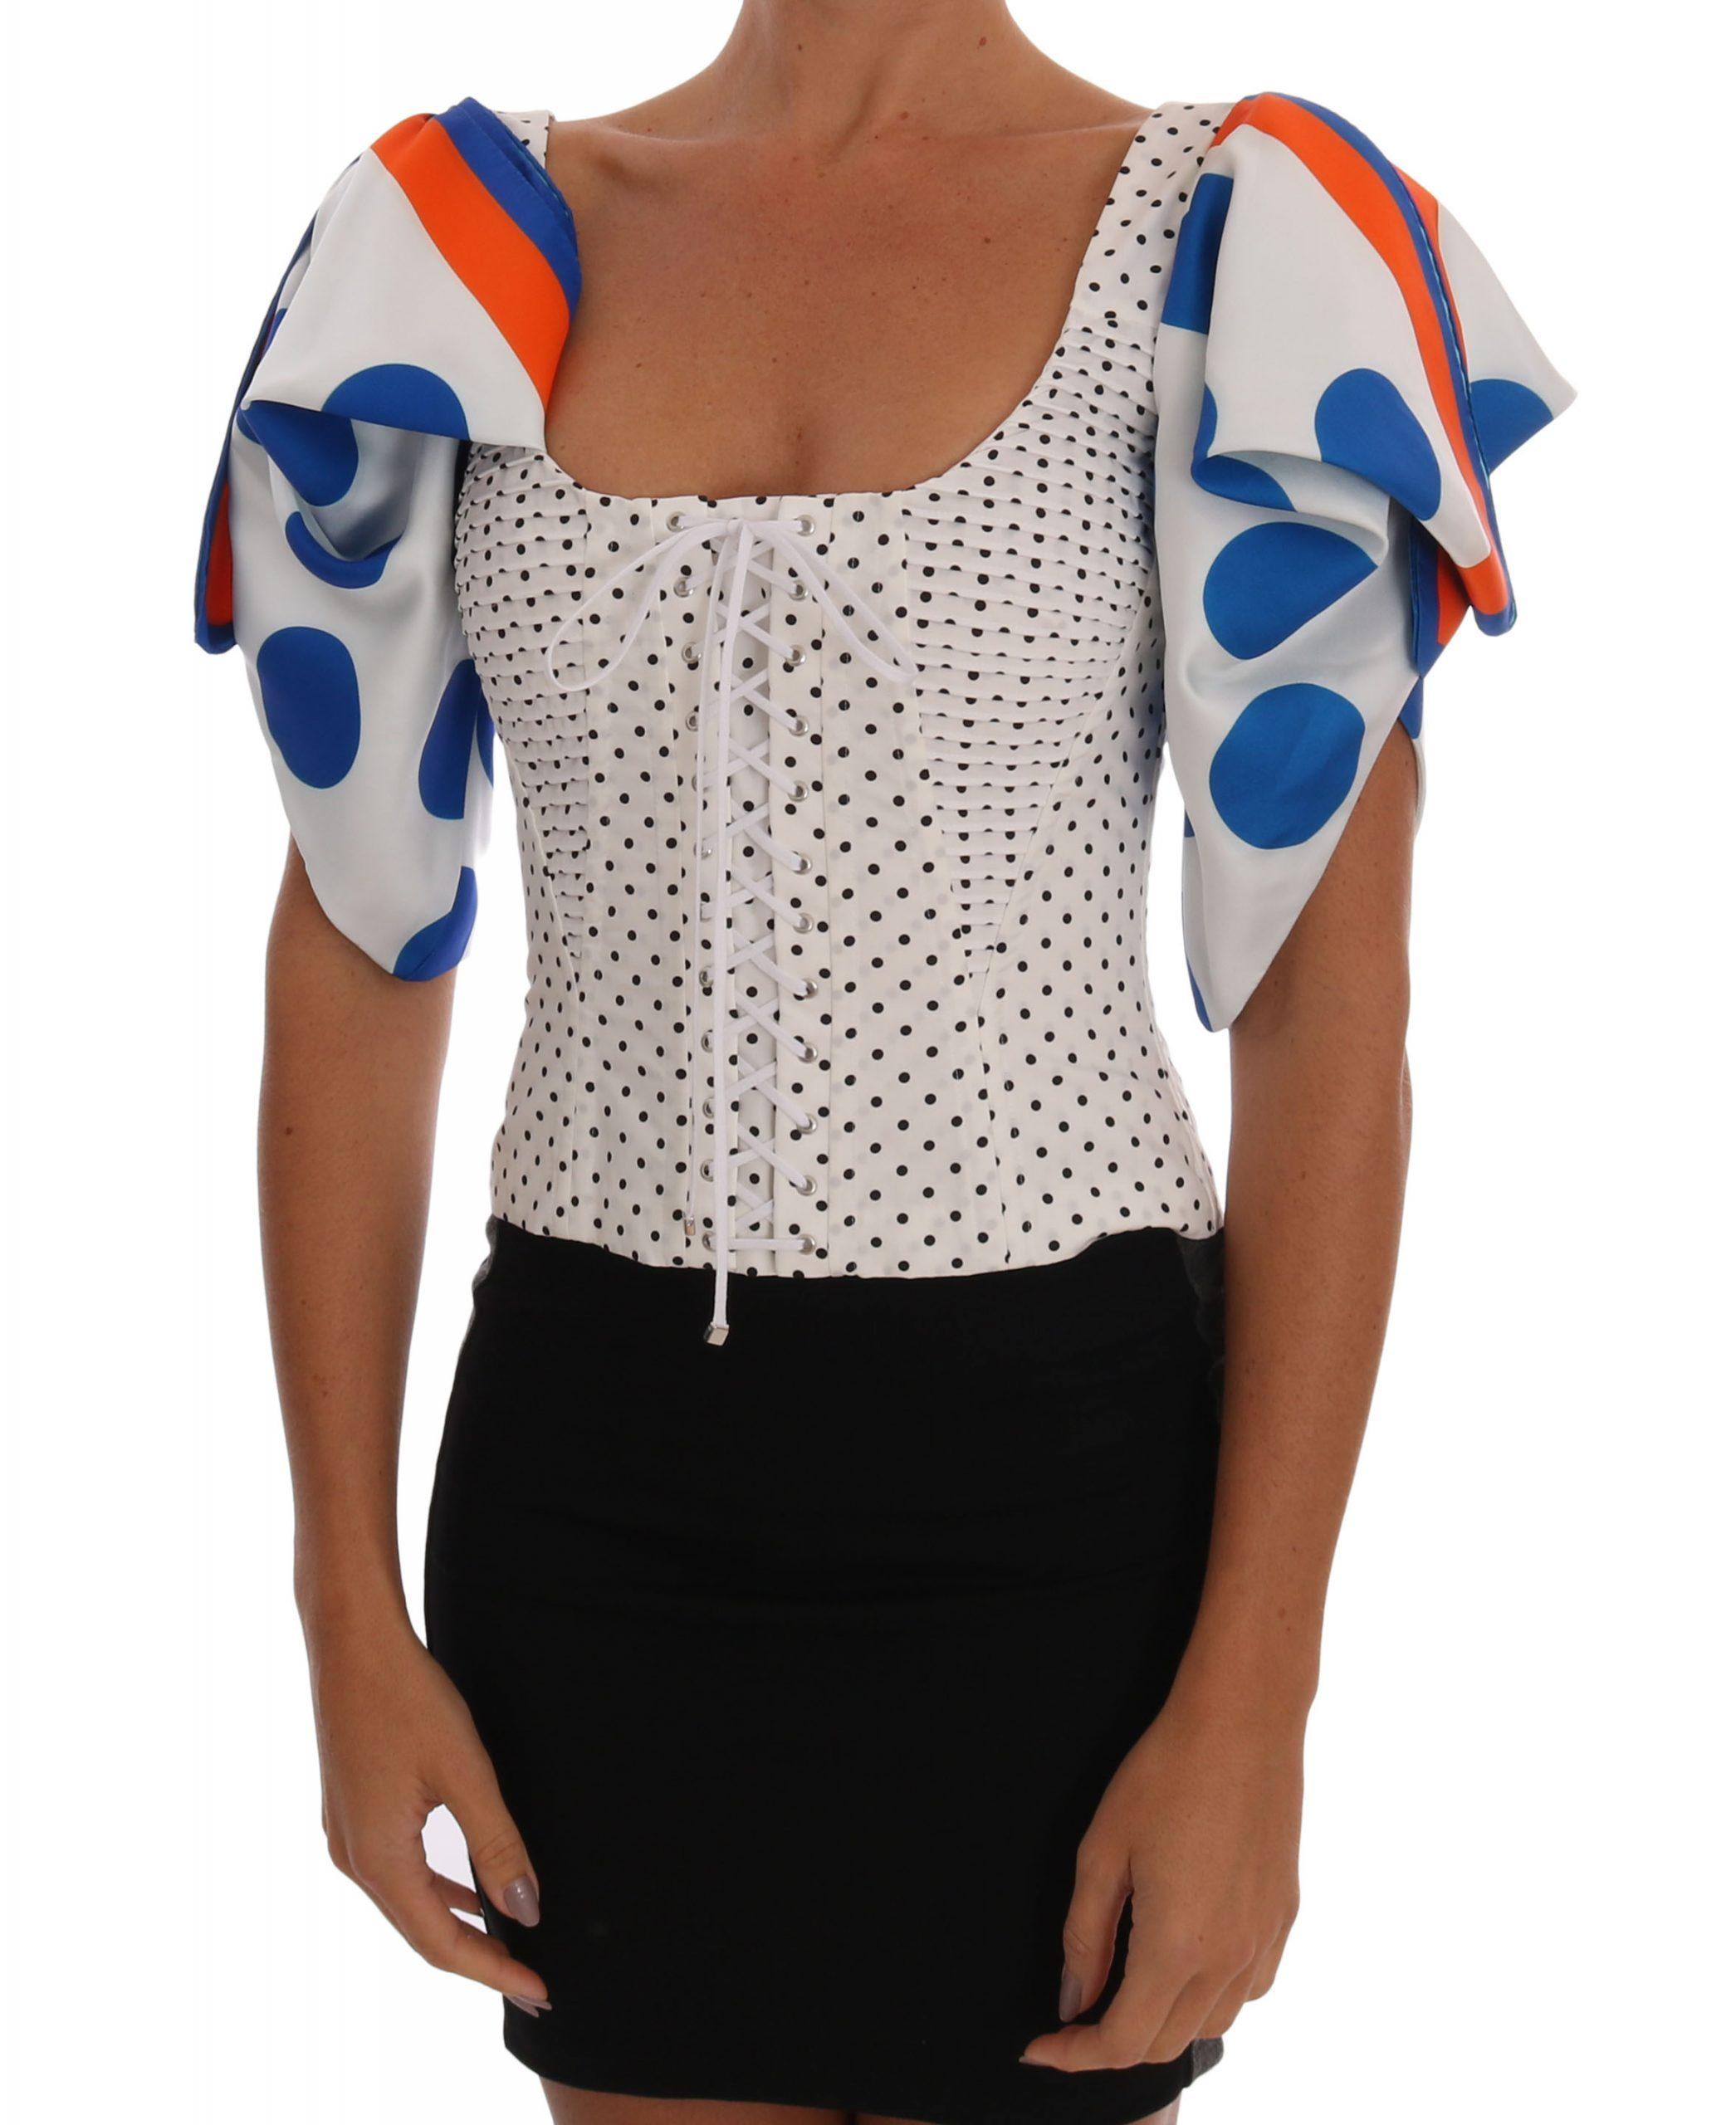 Dolce & Gabbana Women's Polka Silk Tops Black/White TSH1521 - IT48 XXL